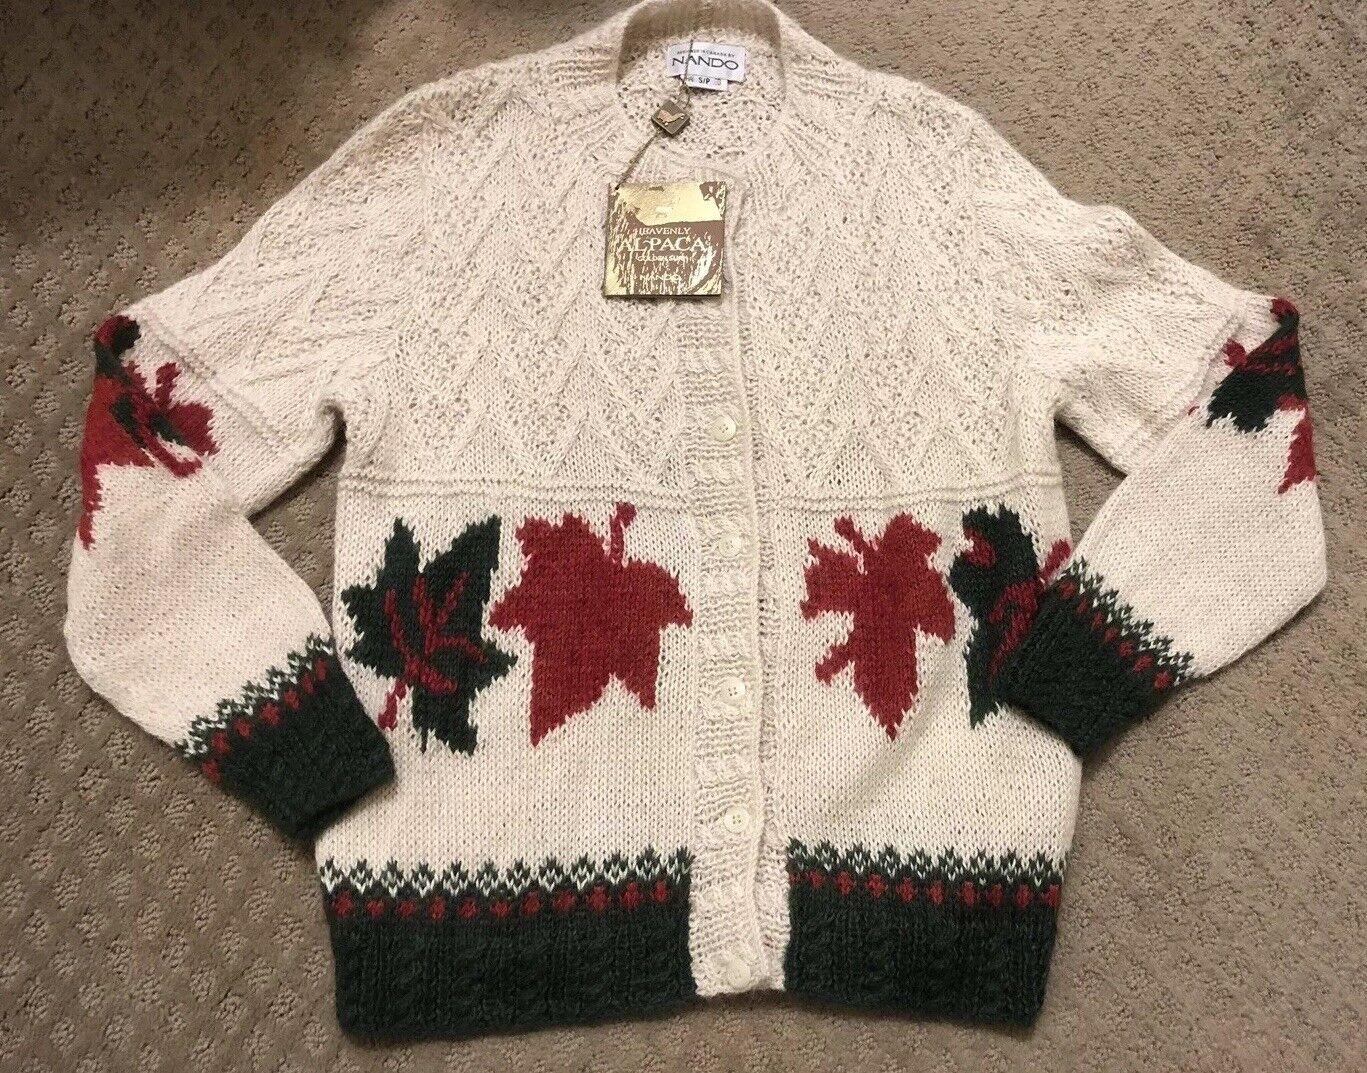 Nando Canadian Sweater Intarsia Hand Knit Knit Knit Cardigan 100% Alpaca Sz S NWT 7dcebe